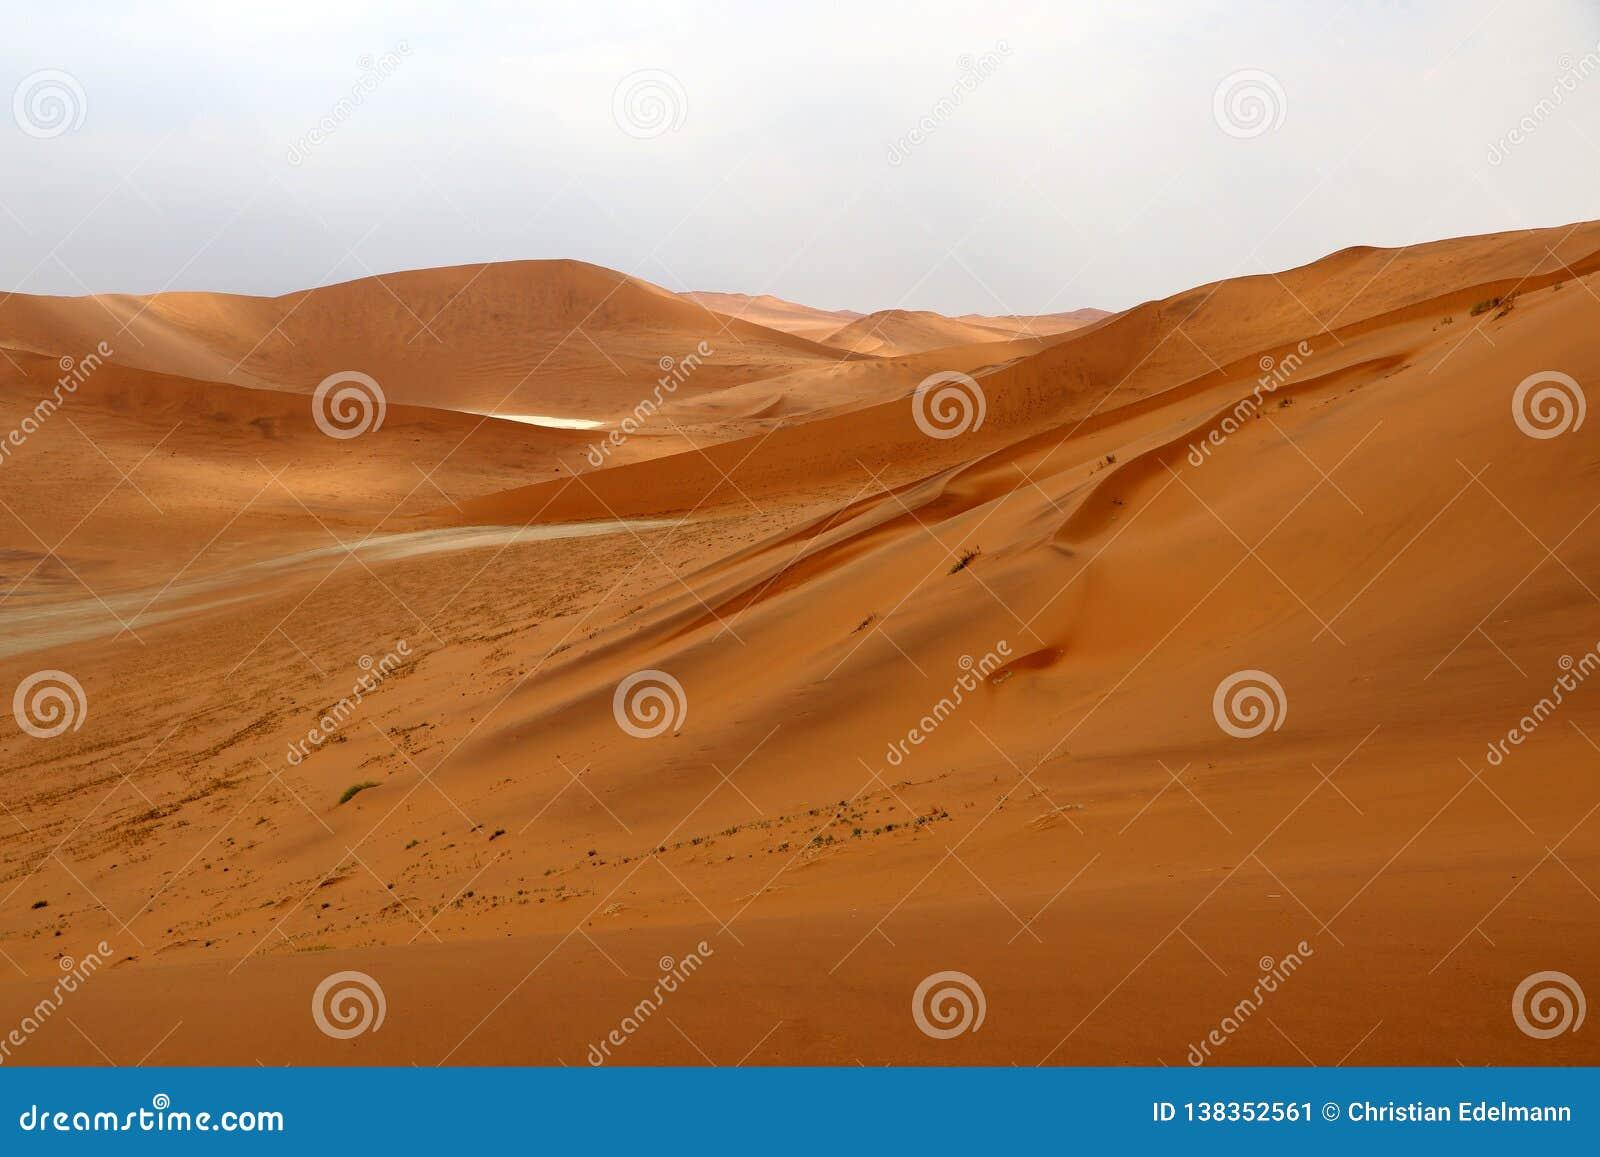 Big Daddy Sand Dune Sossusvlei Namibia Africa Stock Image